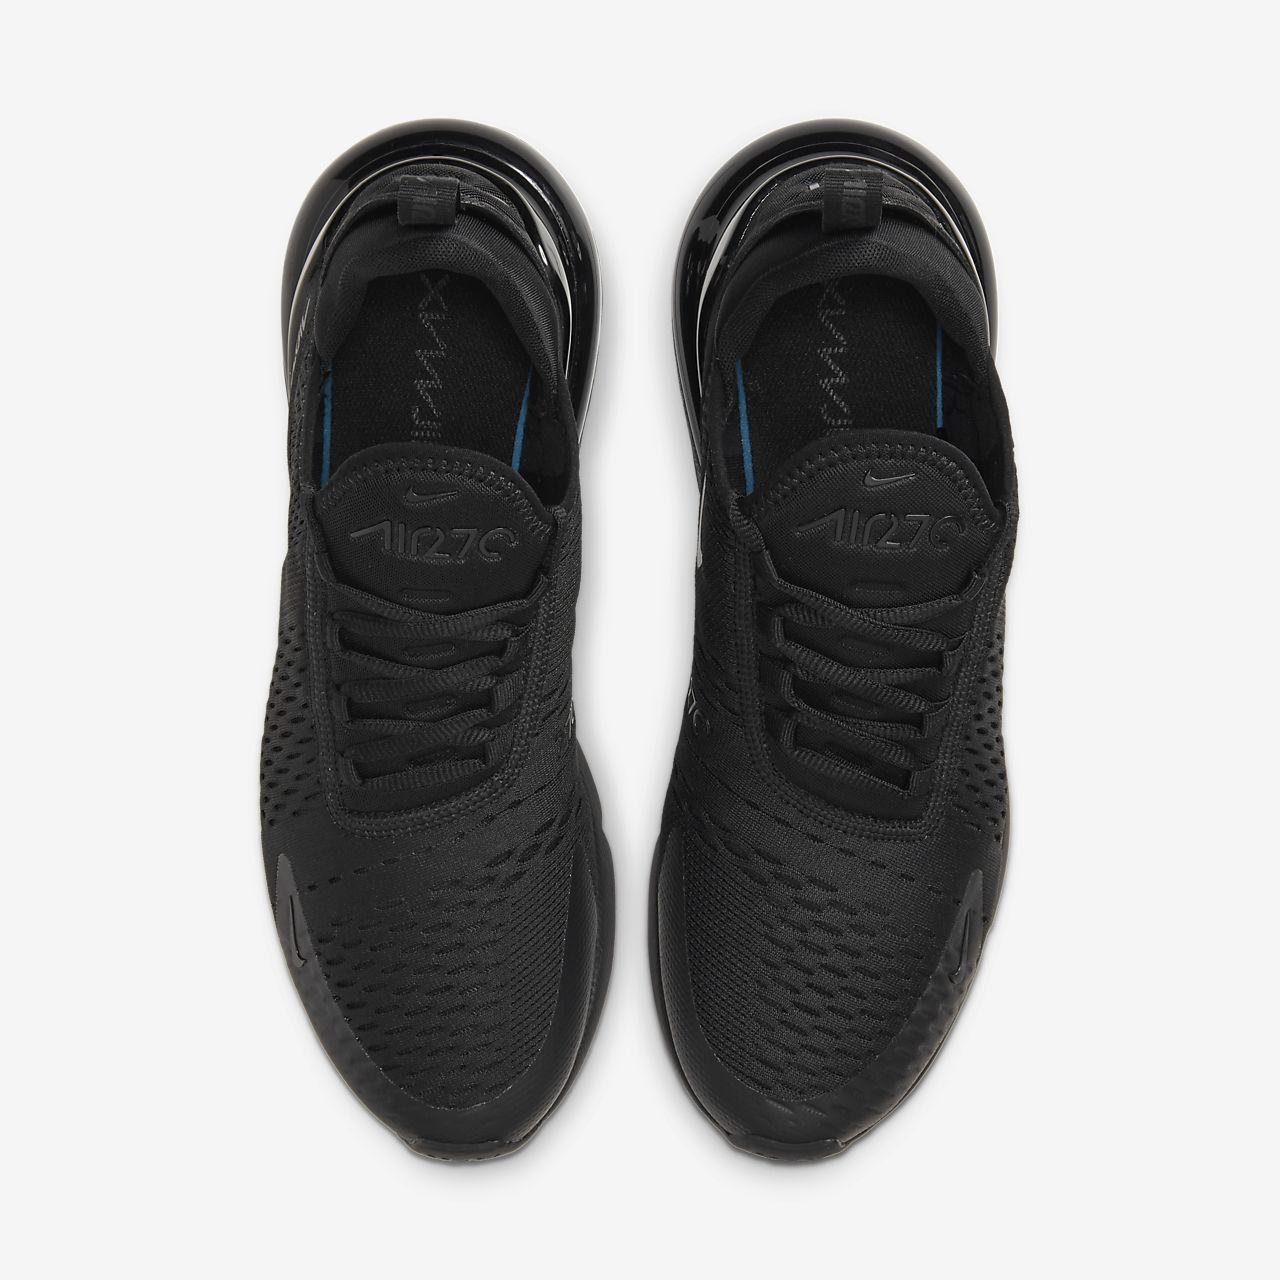 f1e66ea2af01d Low Resolution Nike Air Max 270 Erkek Ayakkabısı Nike Air Max 270 Erkek  Ayakkabısı